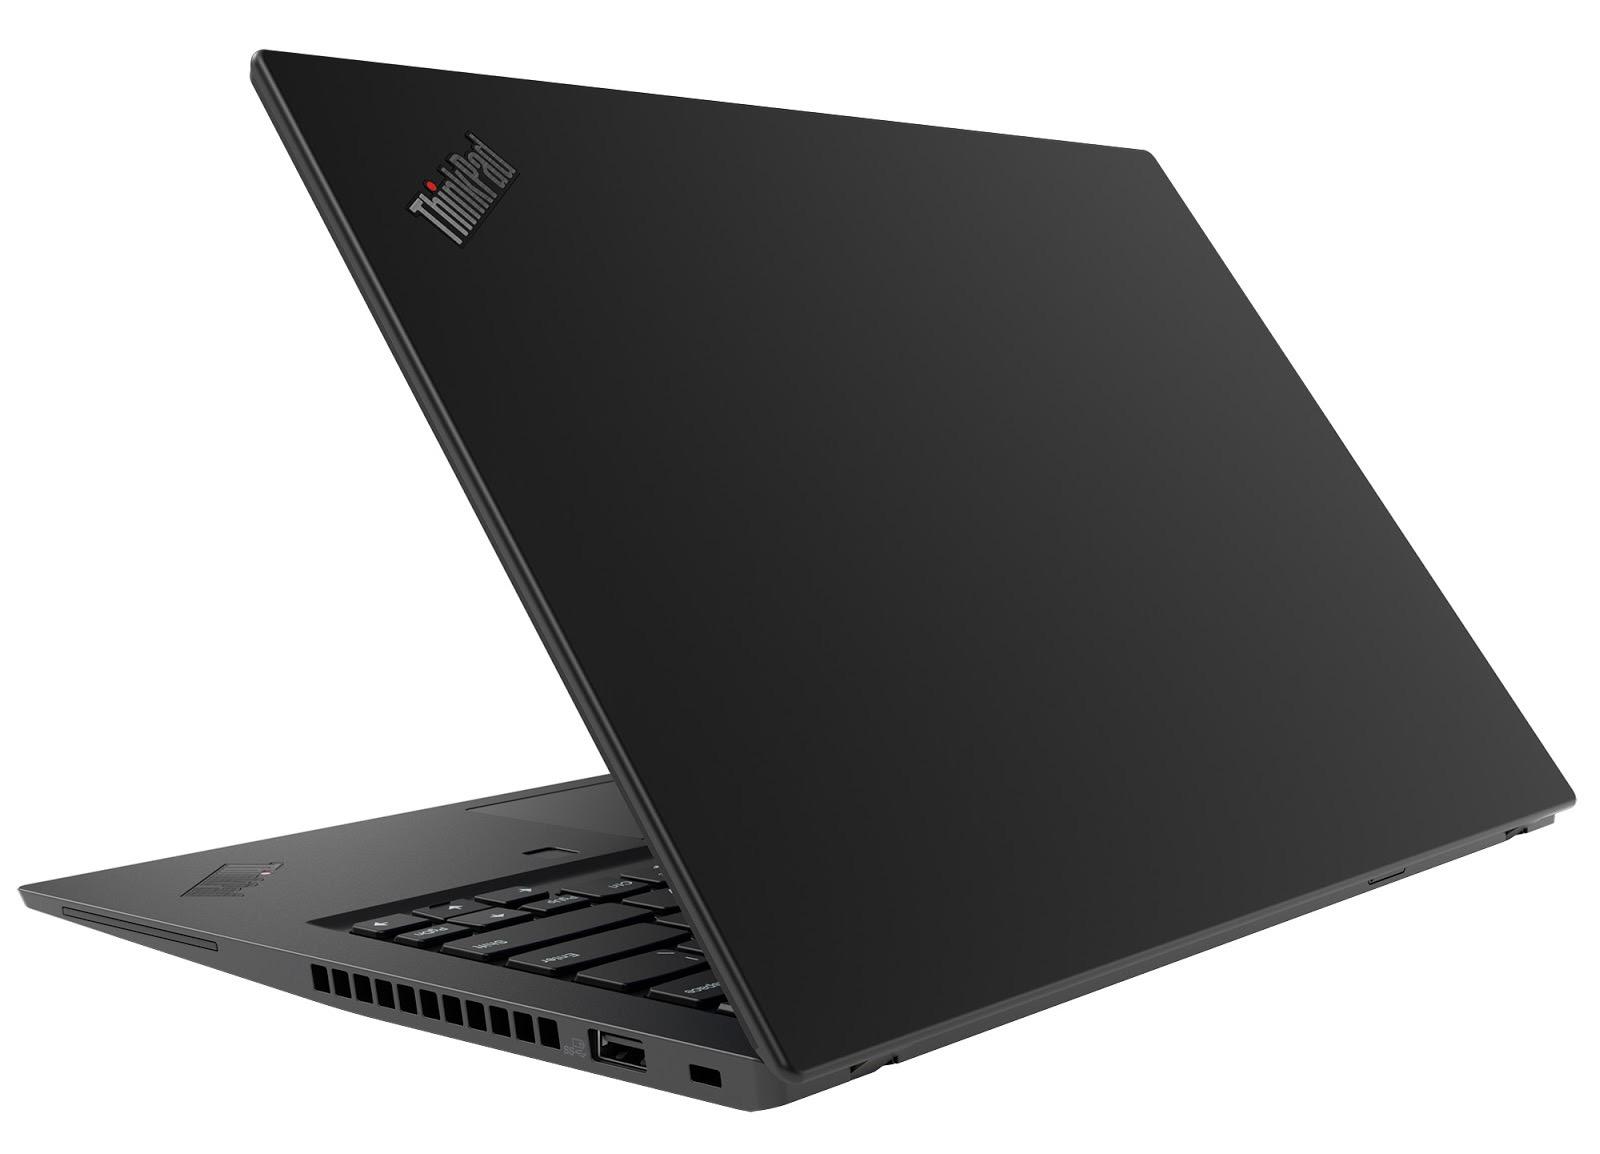 Фото 2. Ноутбук Lenovo ThinkPad T14s Gen 1 Black (20T0001FRT)